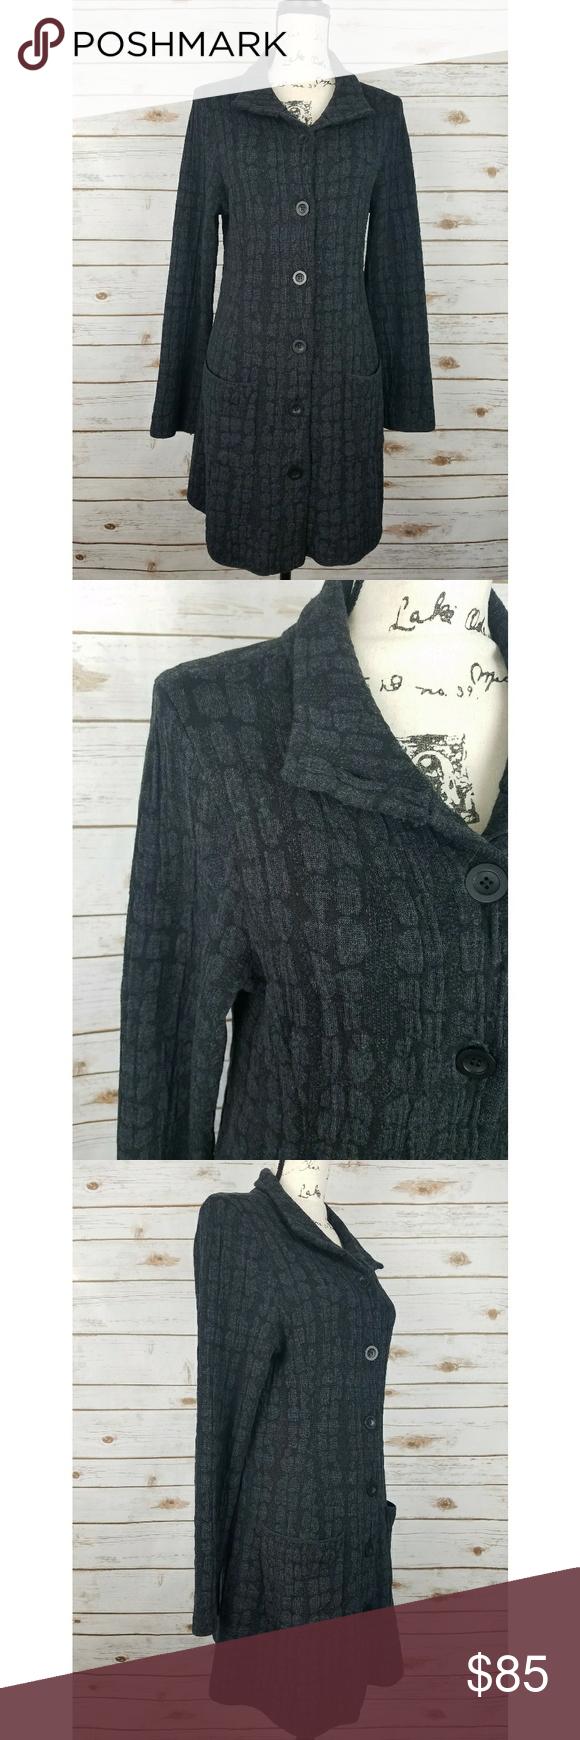 Eileen Fisher Button Up Cardigan Sweater Wool Mix | Eileen fisher ...